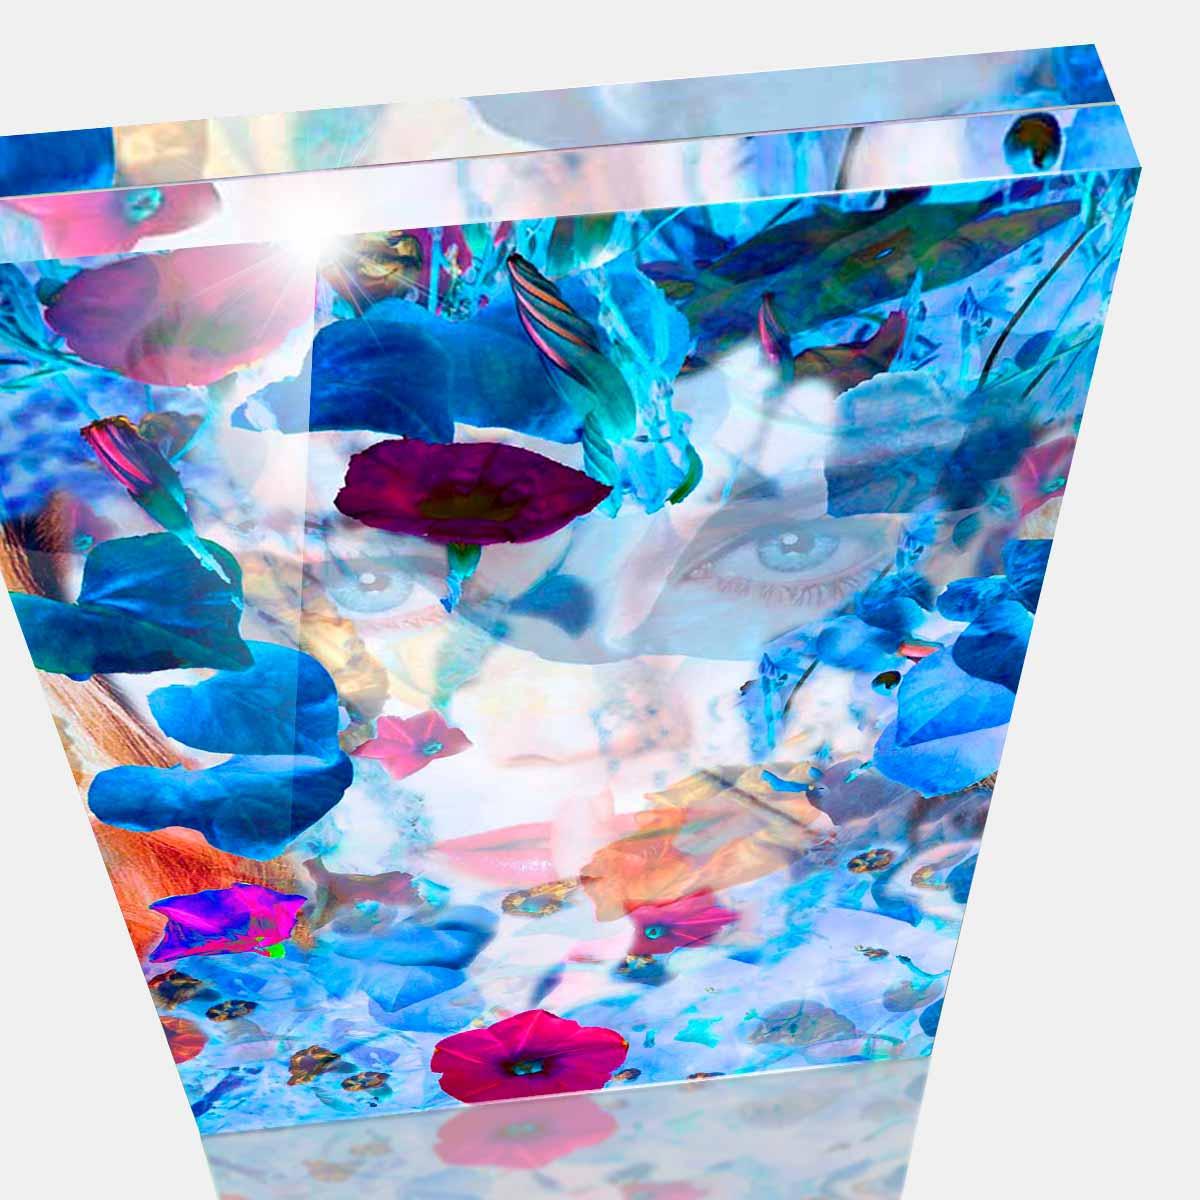 Cornelia Hagmann Contemporary Artist Artwork Acrylic Glass Sculpture La Galleria Art Design Big Sleep